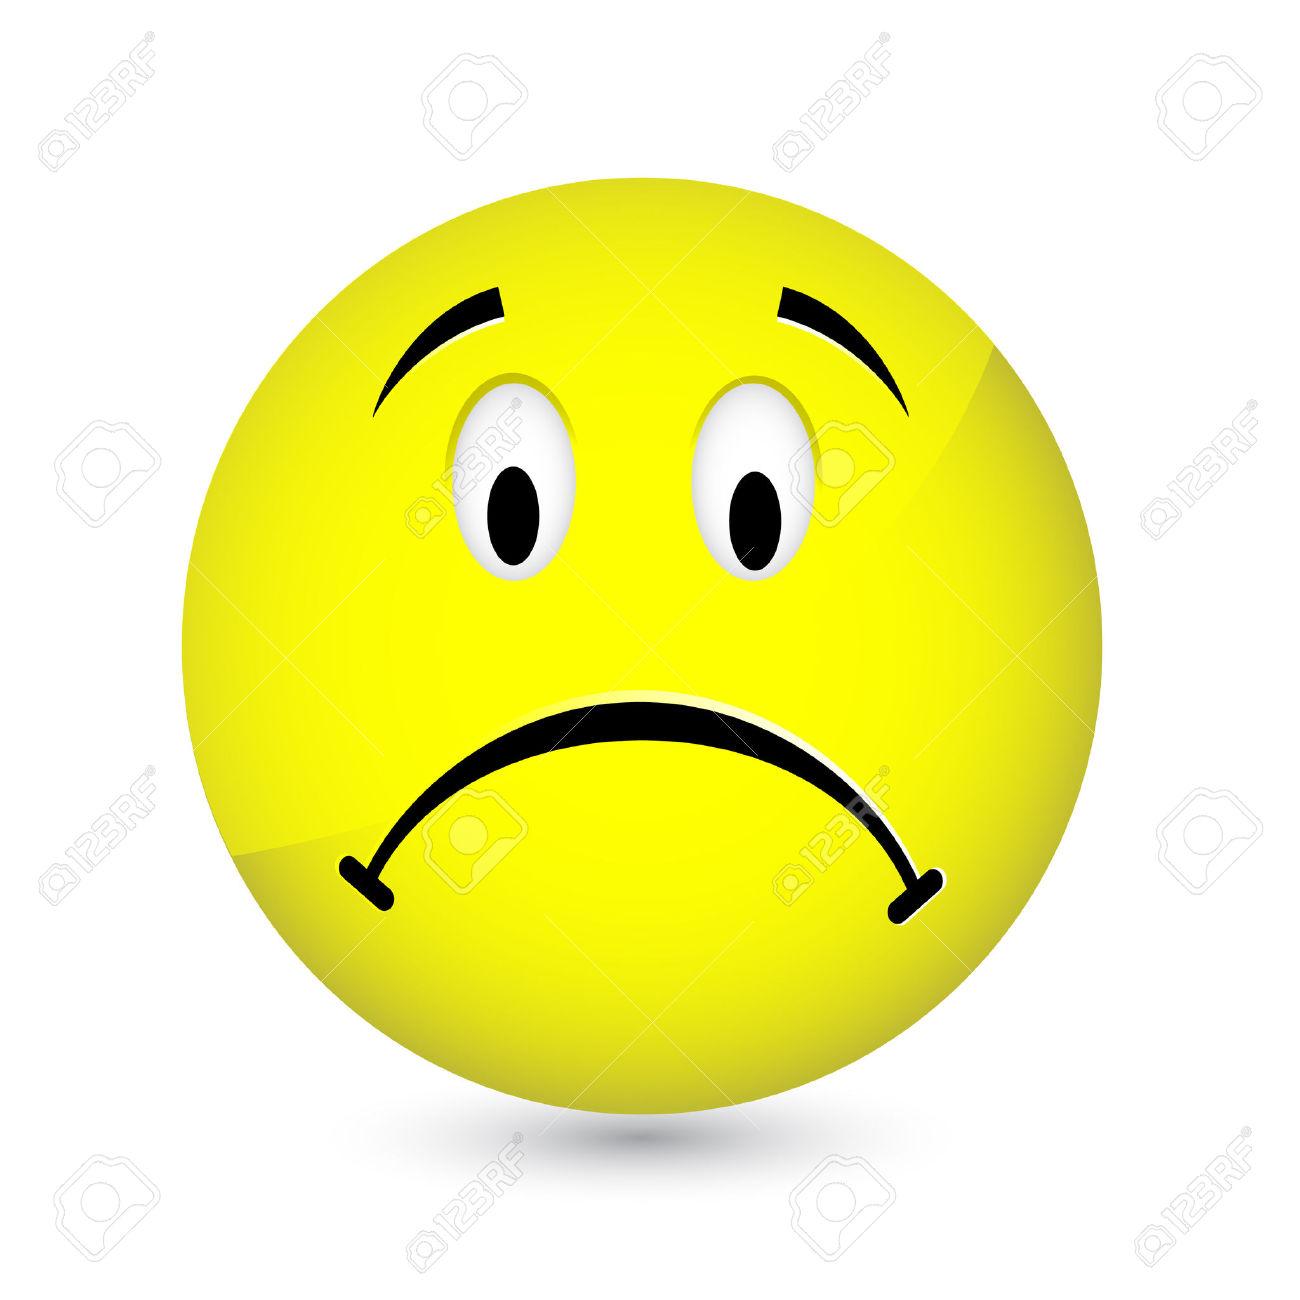 Sad Face Clipart - .